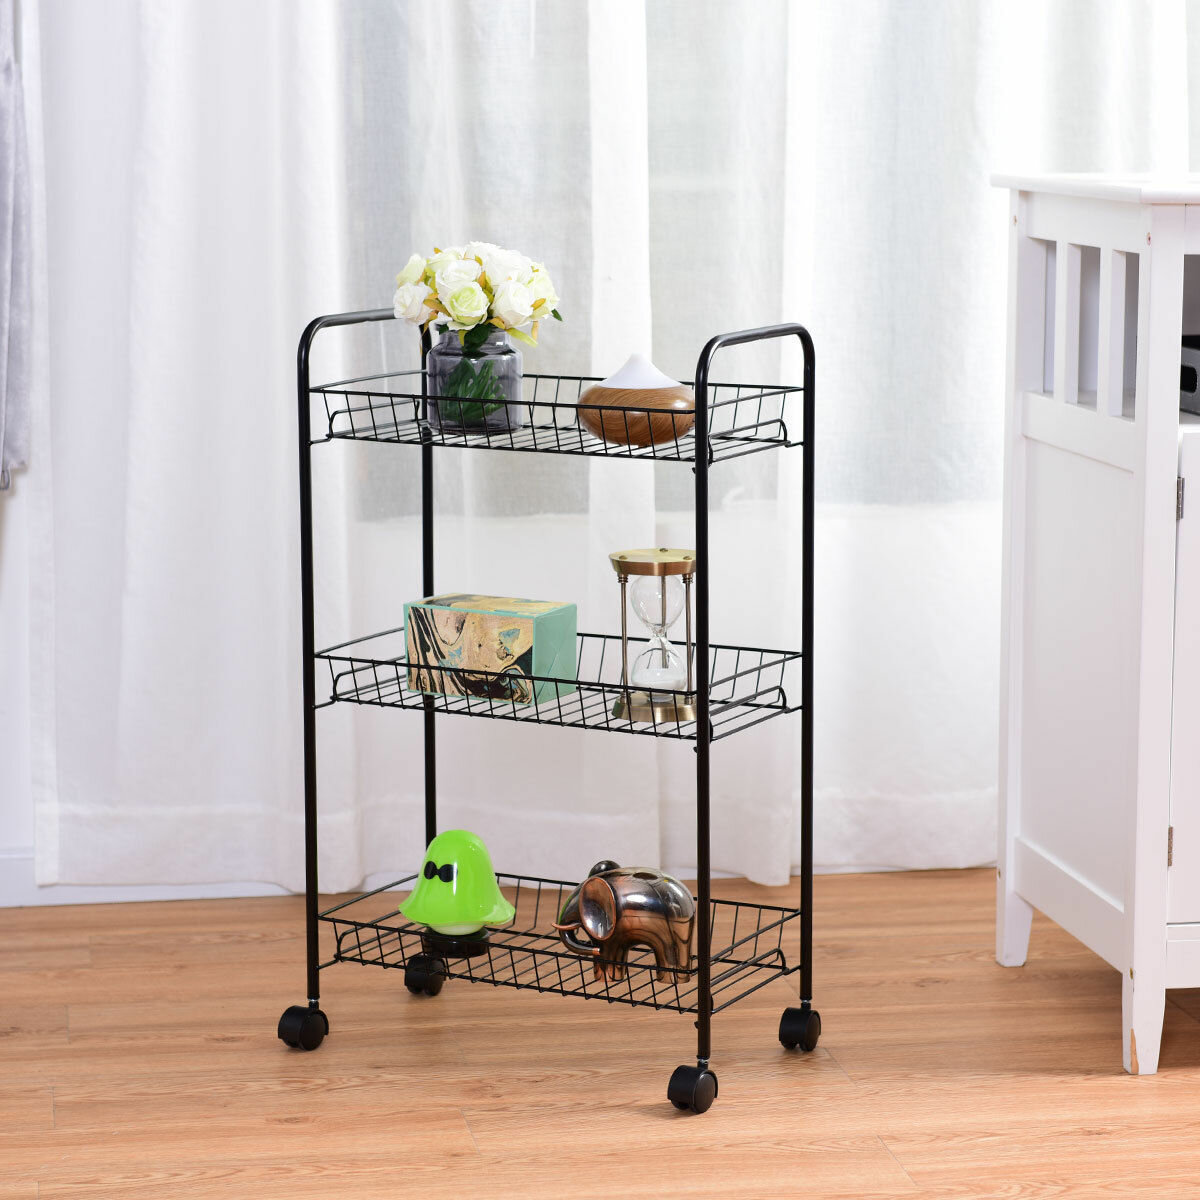 Costway 3 tier rolling kitchen trolley utility cart wire storage shelf baskets wayfair